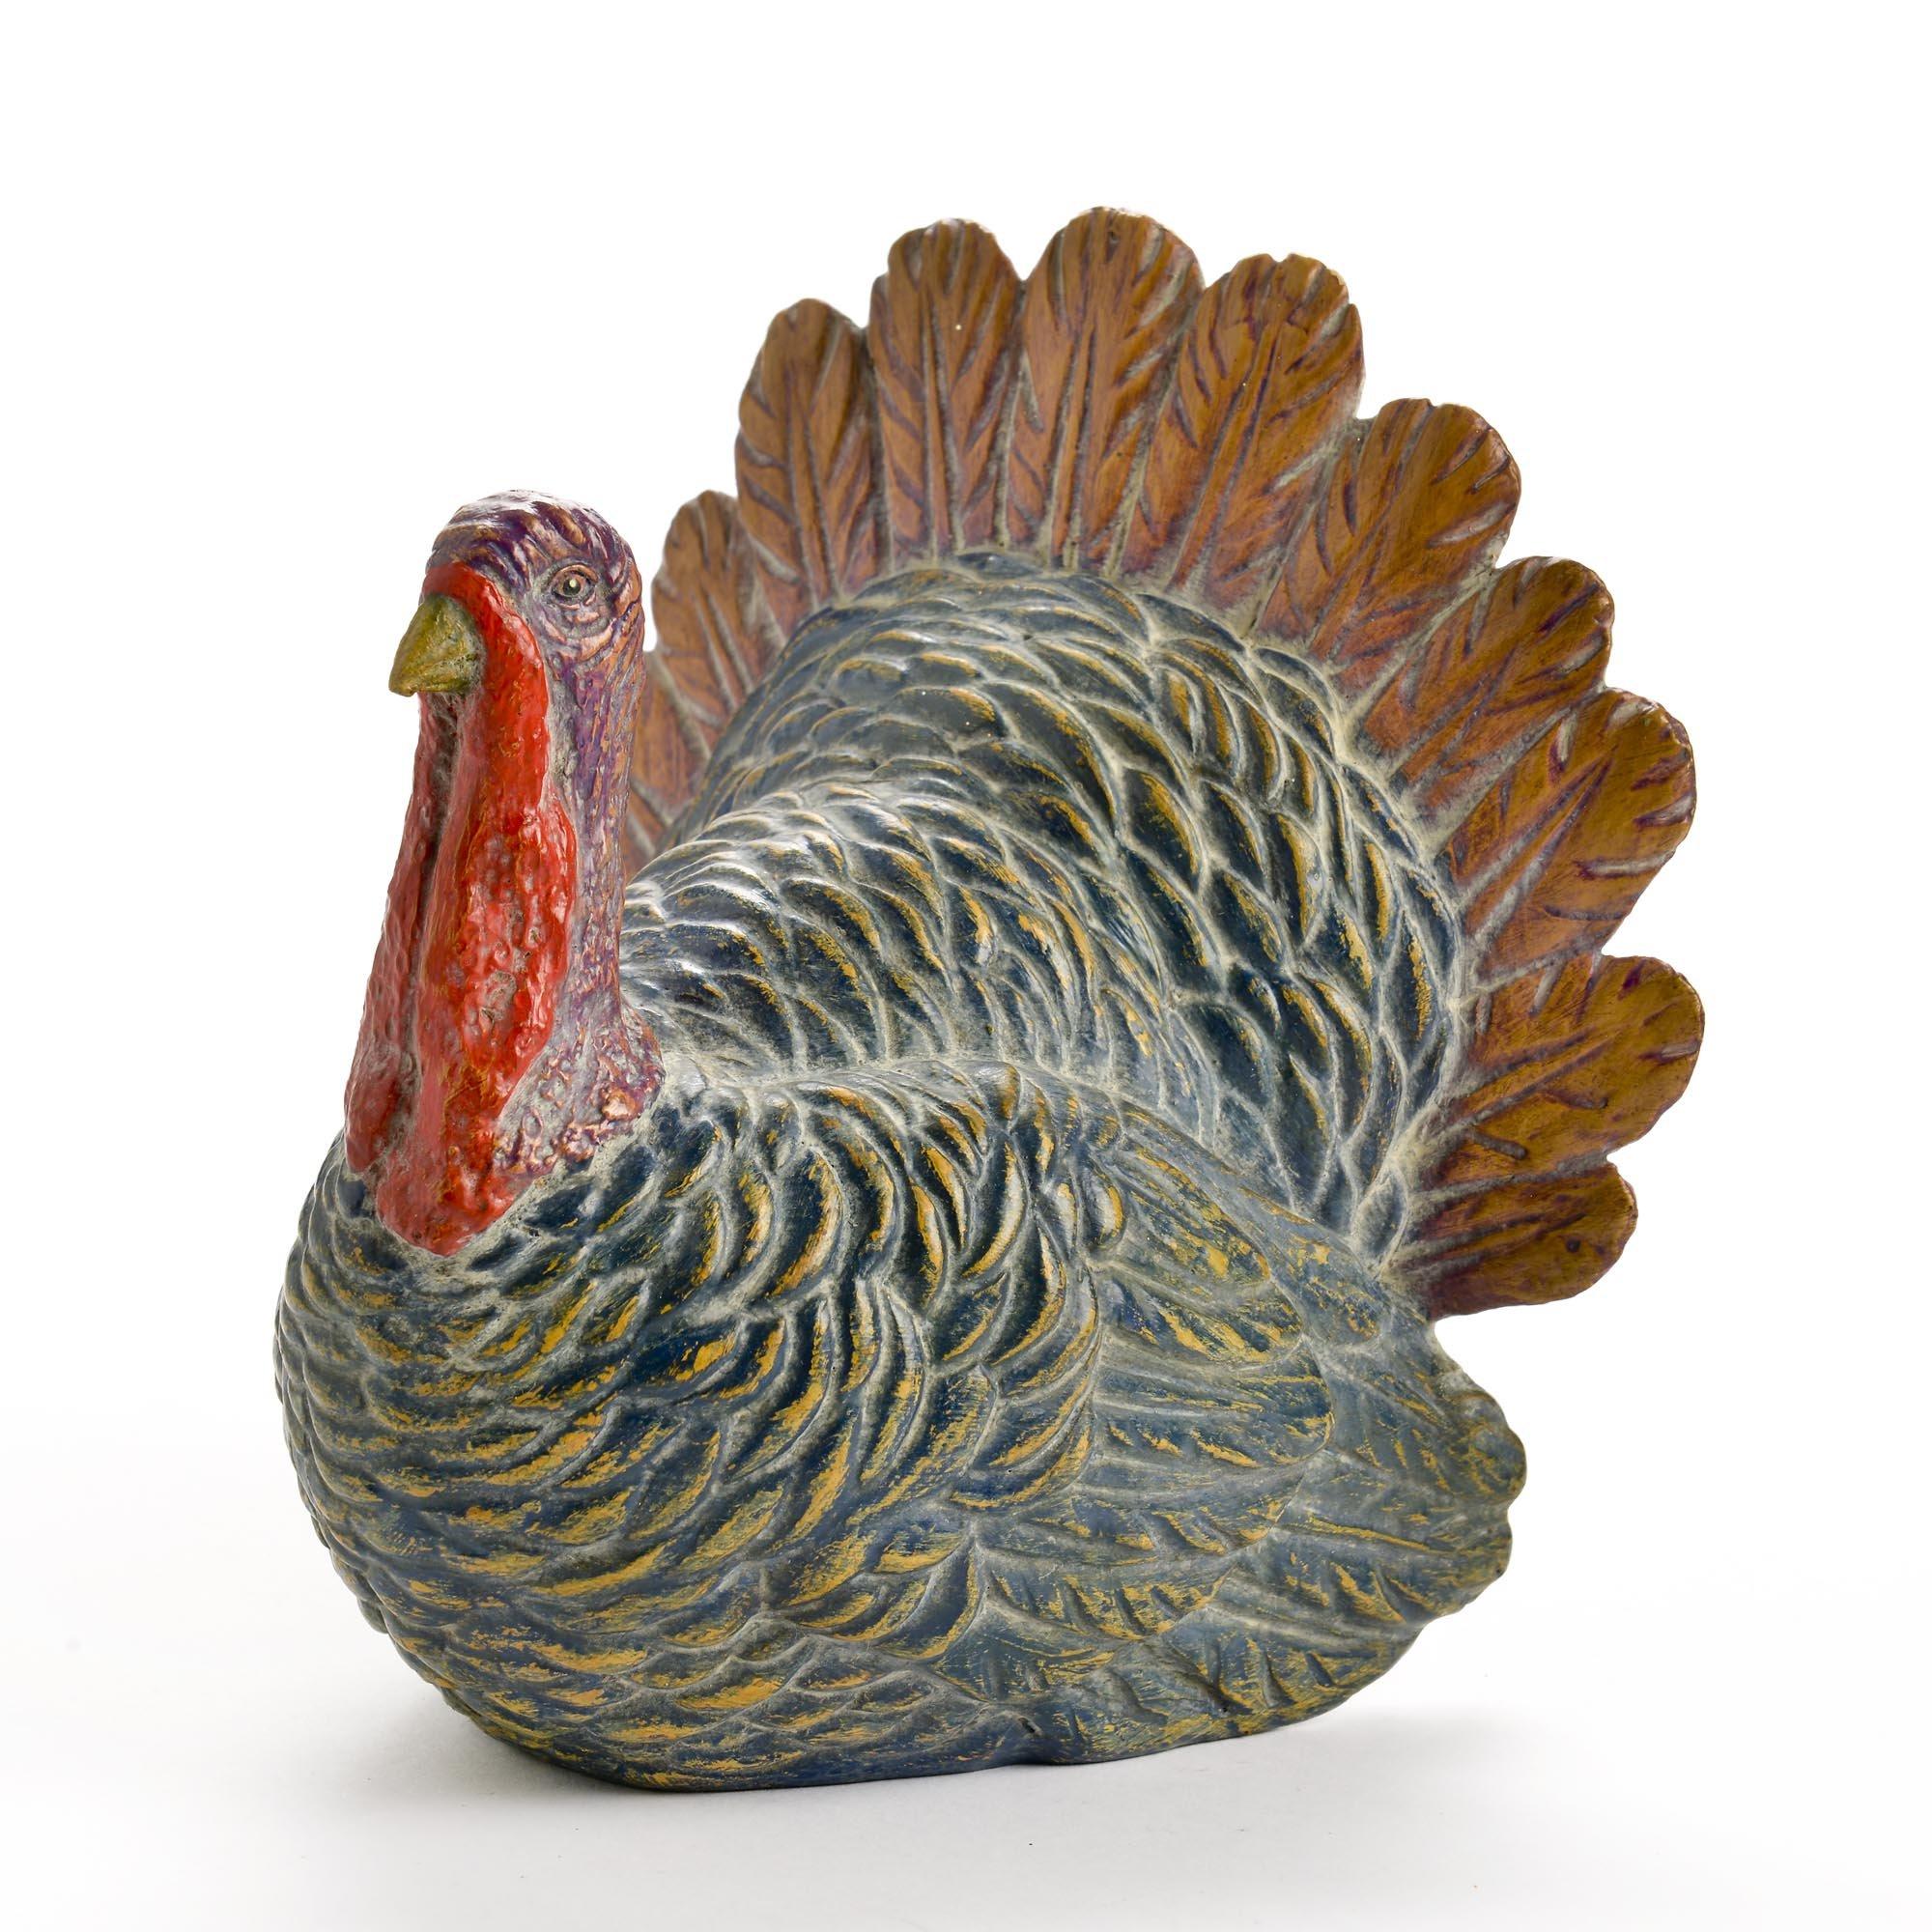 Caffco Fall Turkey Small Resin Thanksgiving Figurine